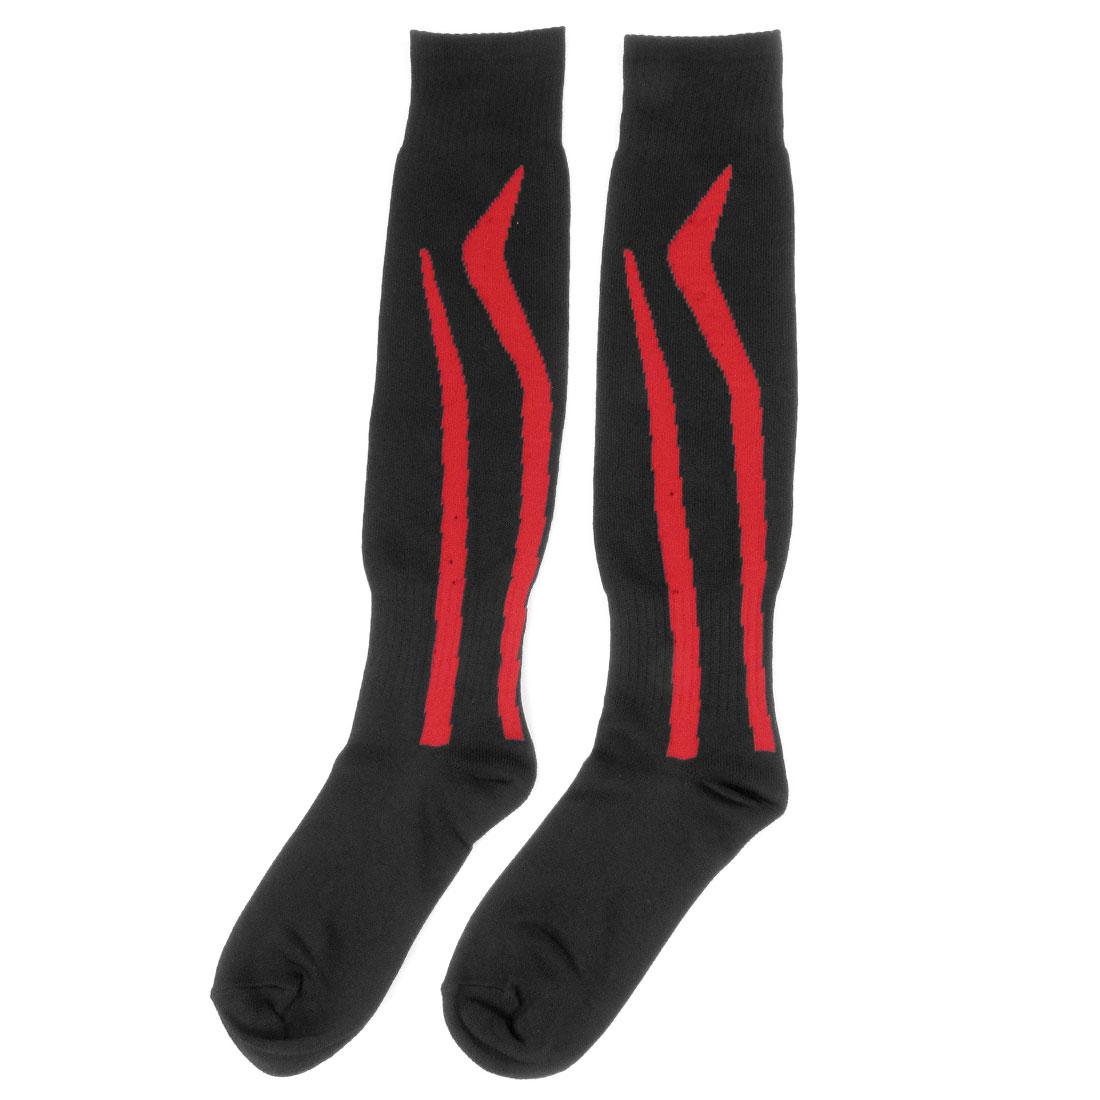 Women Men Red Striped Knee High Hockey Football Socks Stockings Black Pair